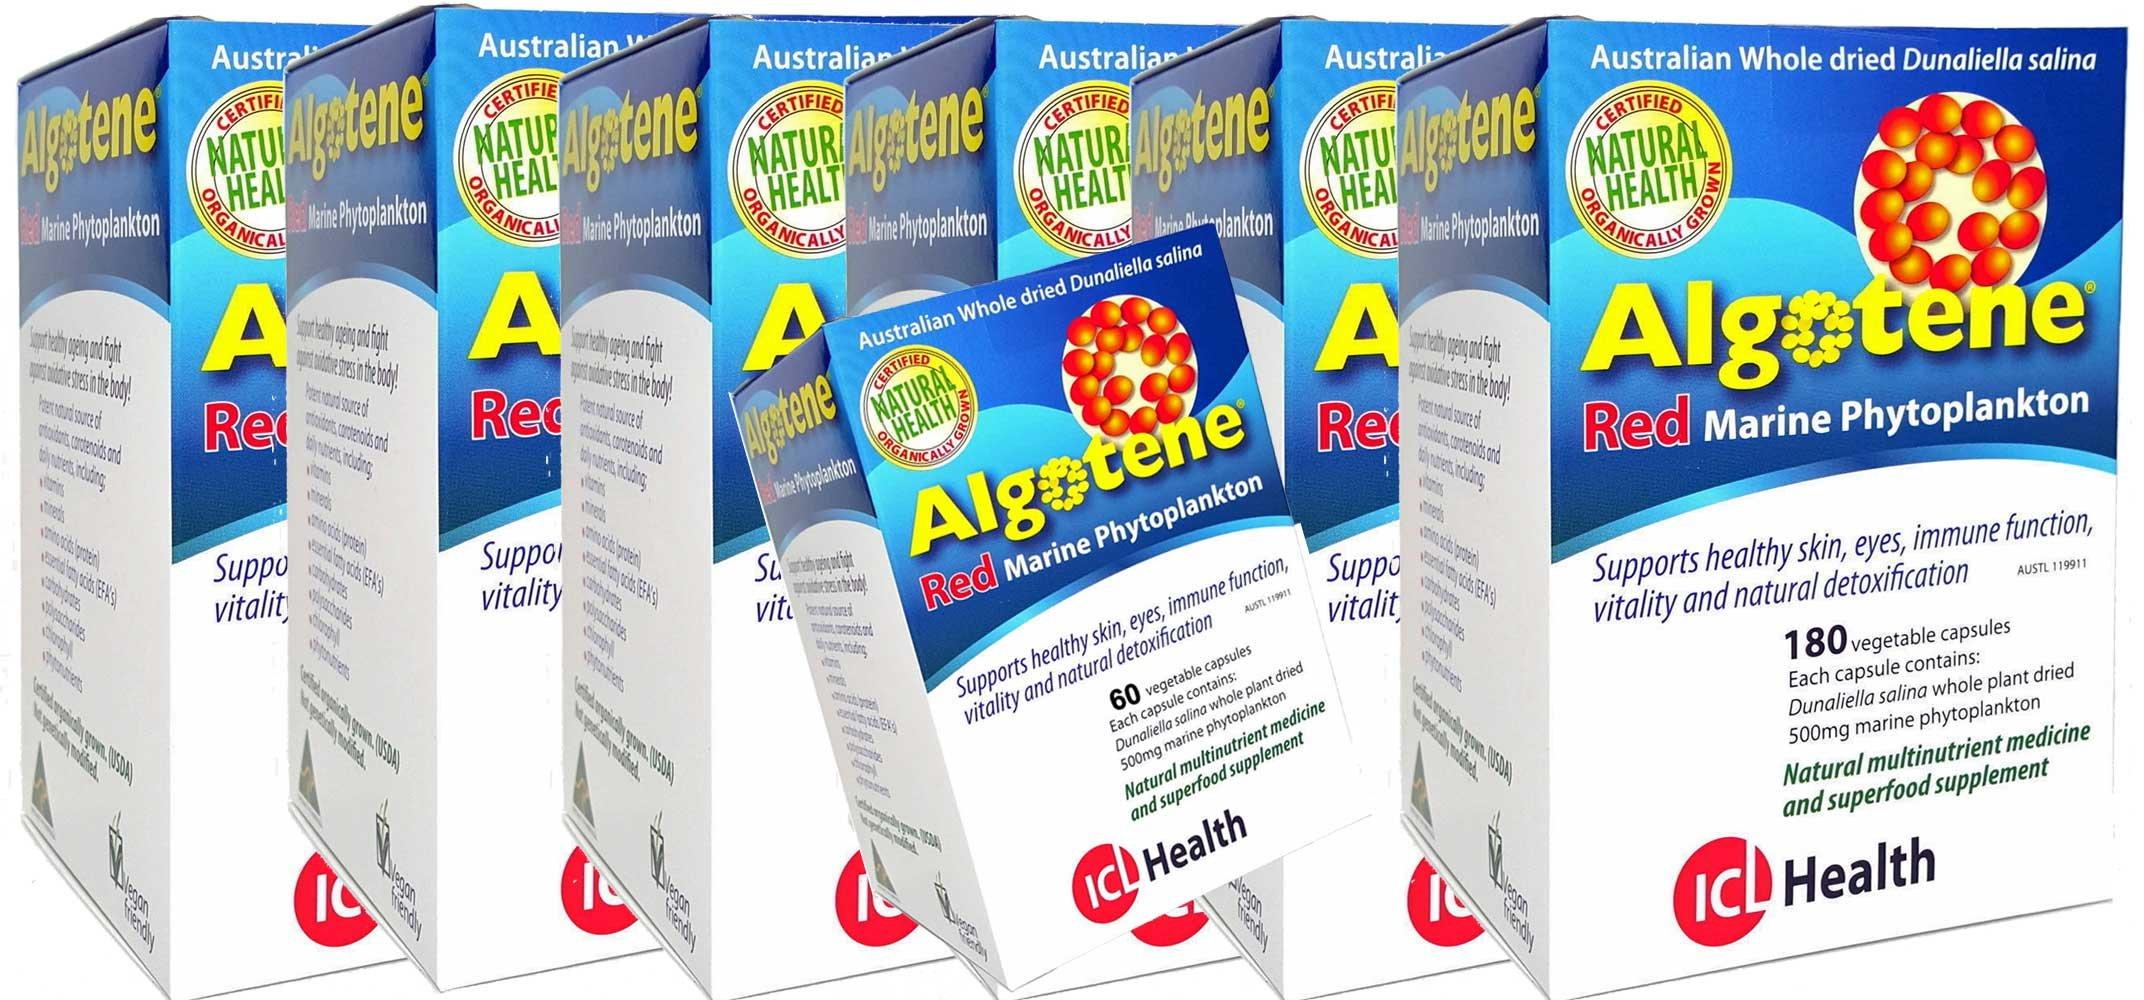 Algotene Dunaliella Salina Red Marine Phytoplankton 6 x 180 Capsules Plus 60 Capsules FREE